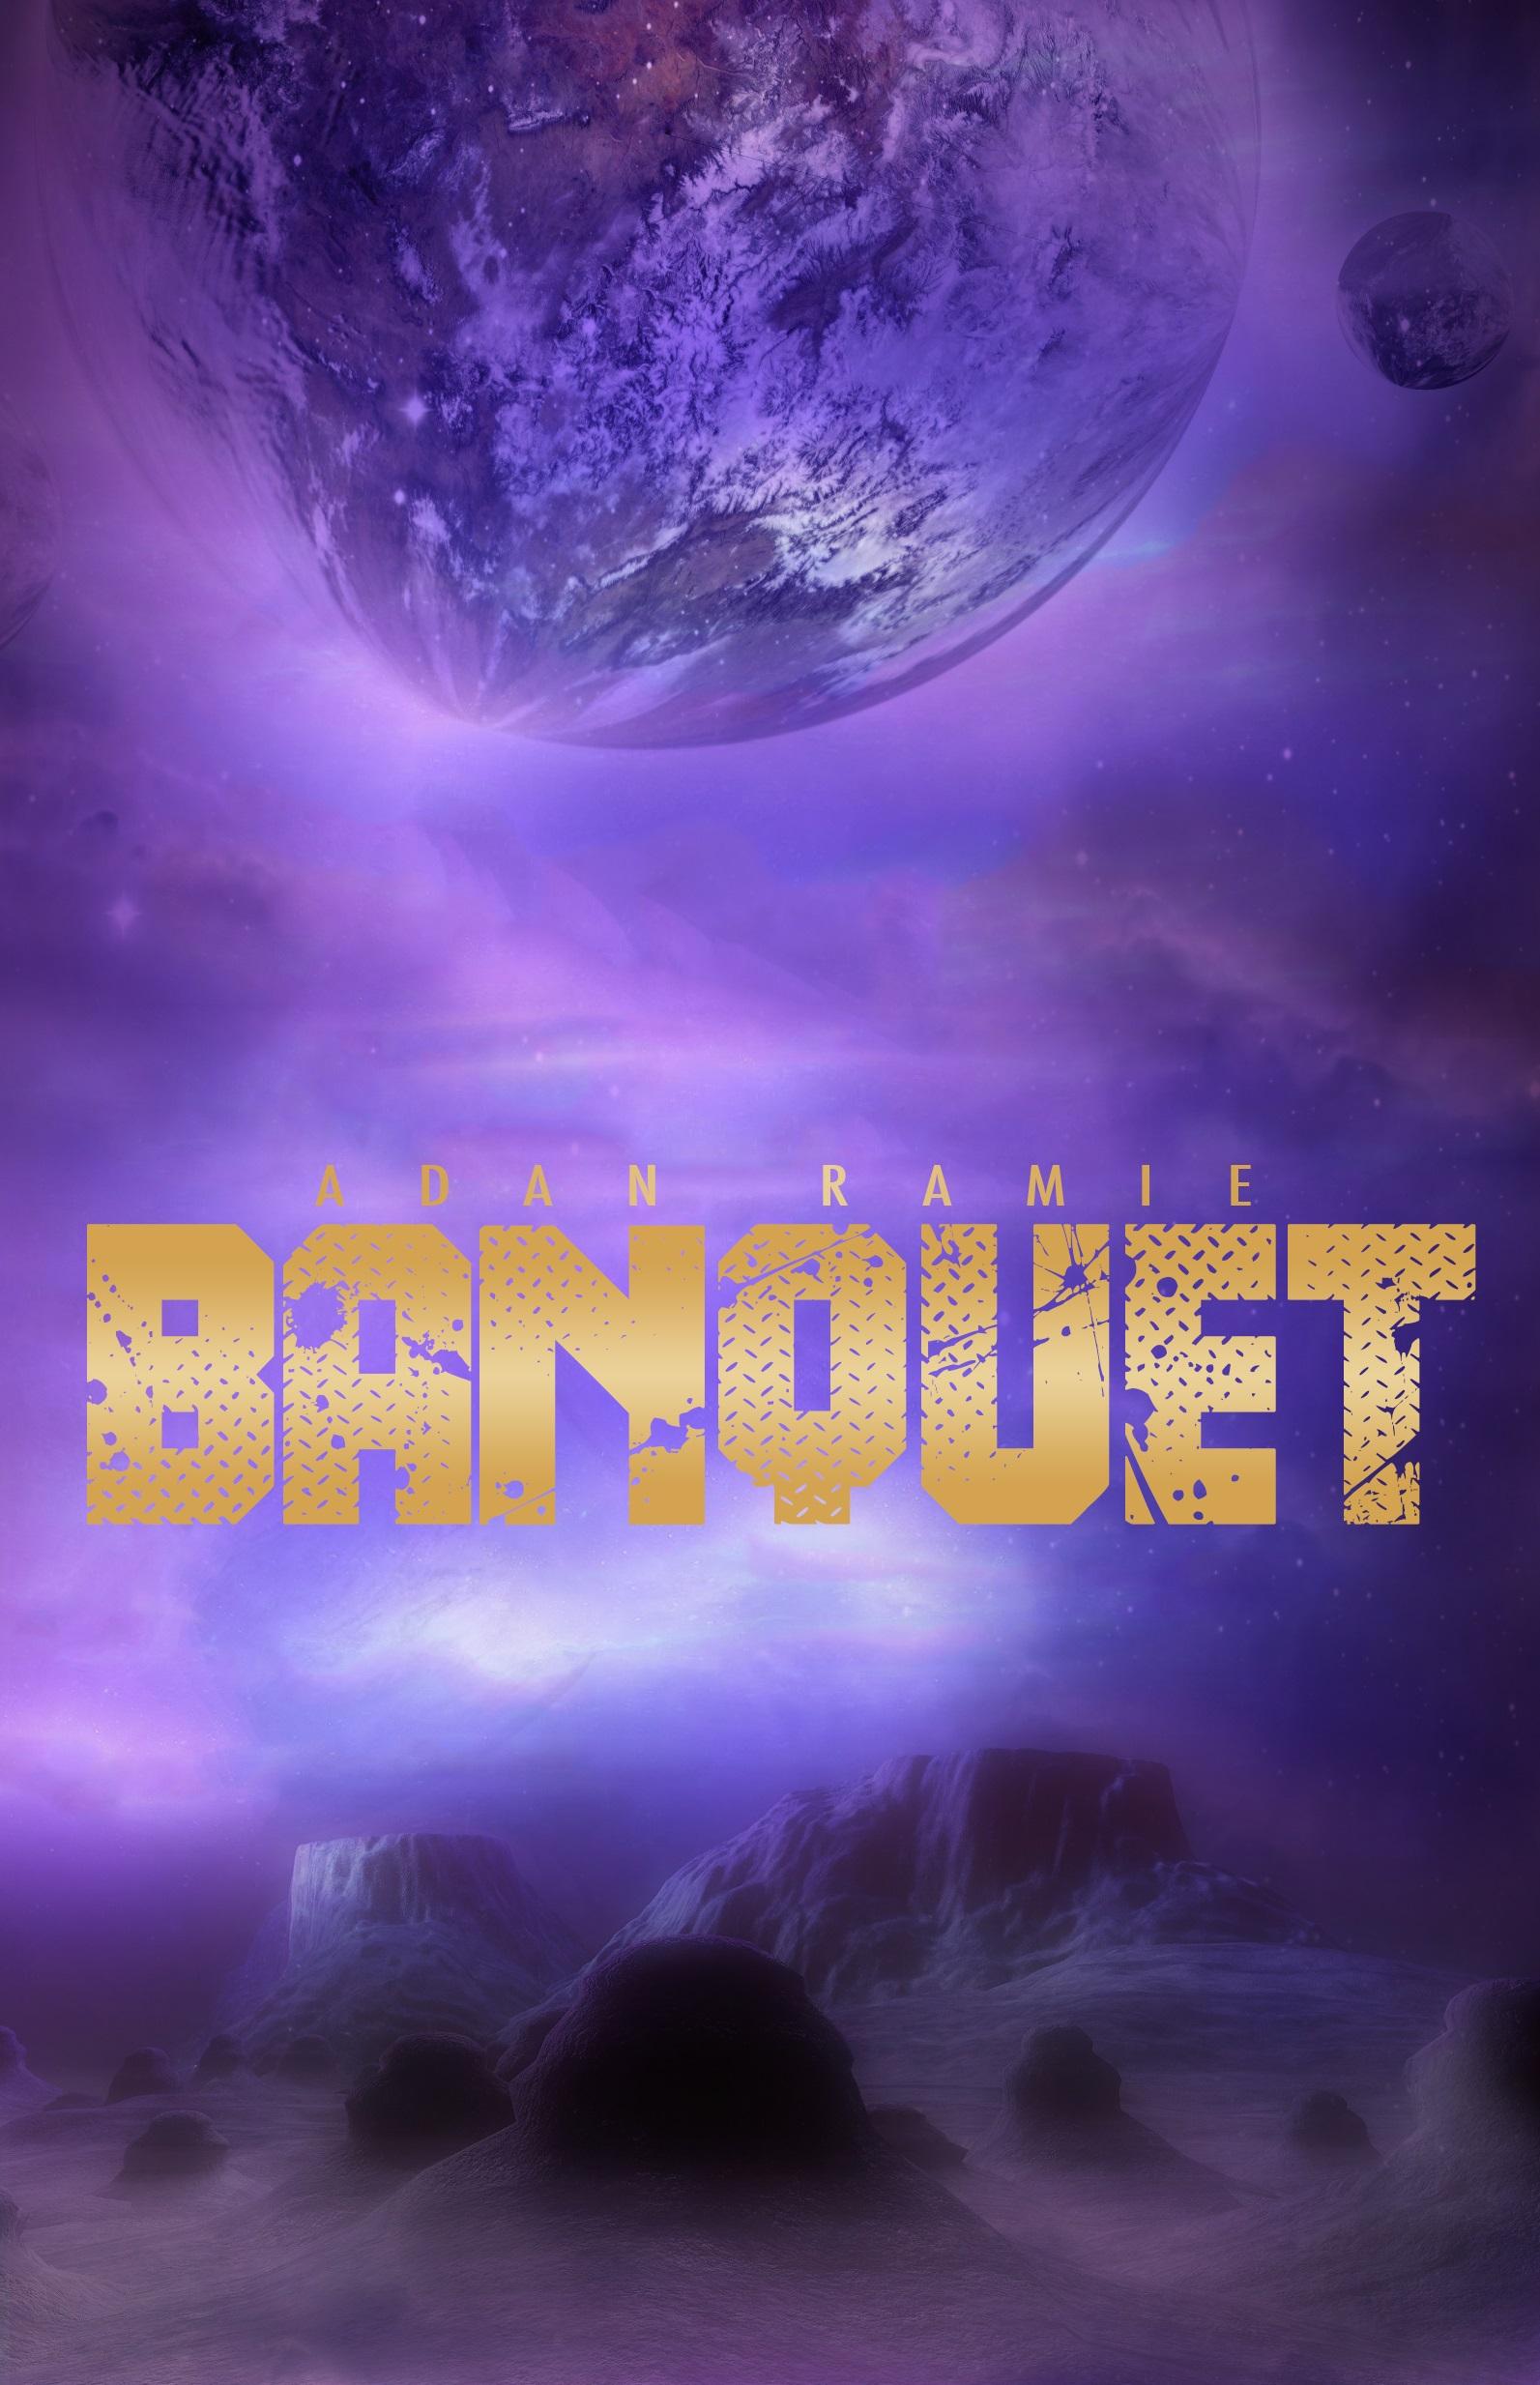 Adan Ramie - Banquet Cover